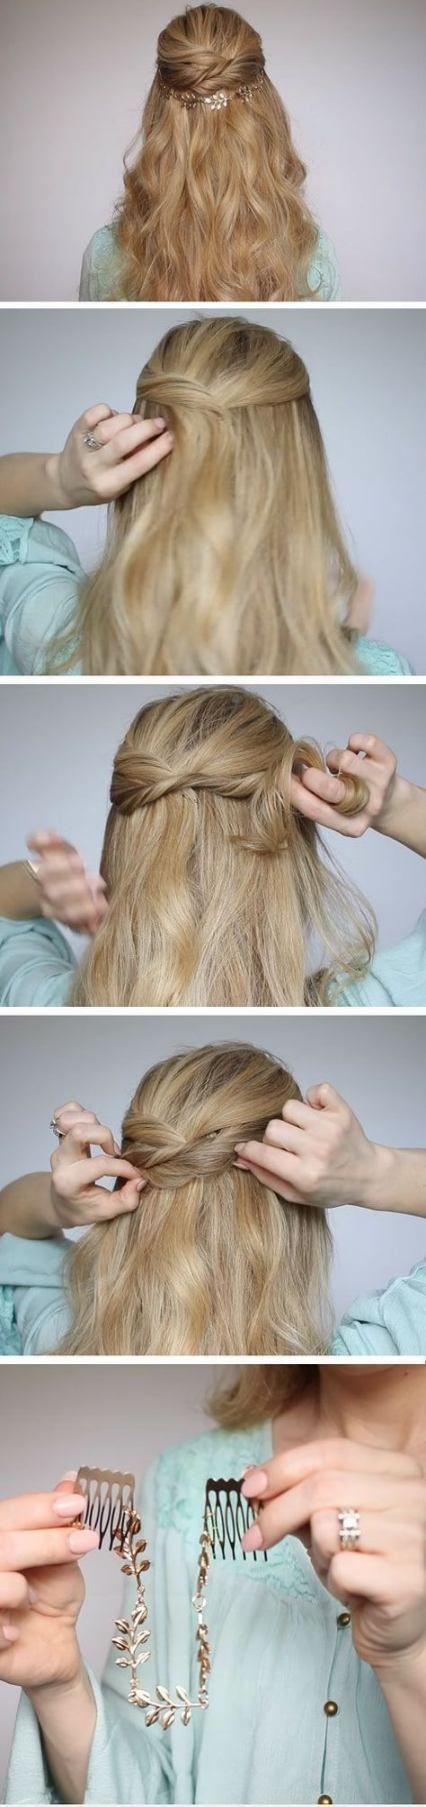 Frisuren Pferdeschwanz Easy 39 Ideen – ❤️ Hairstyles